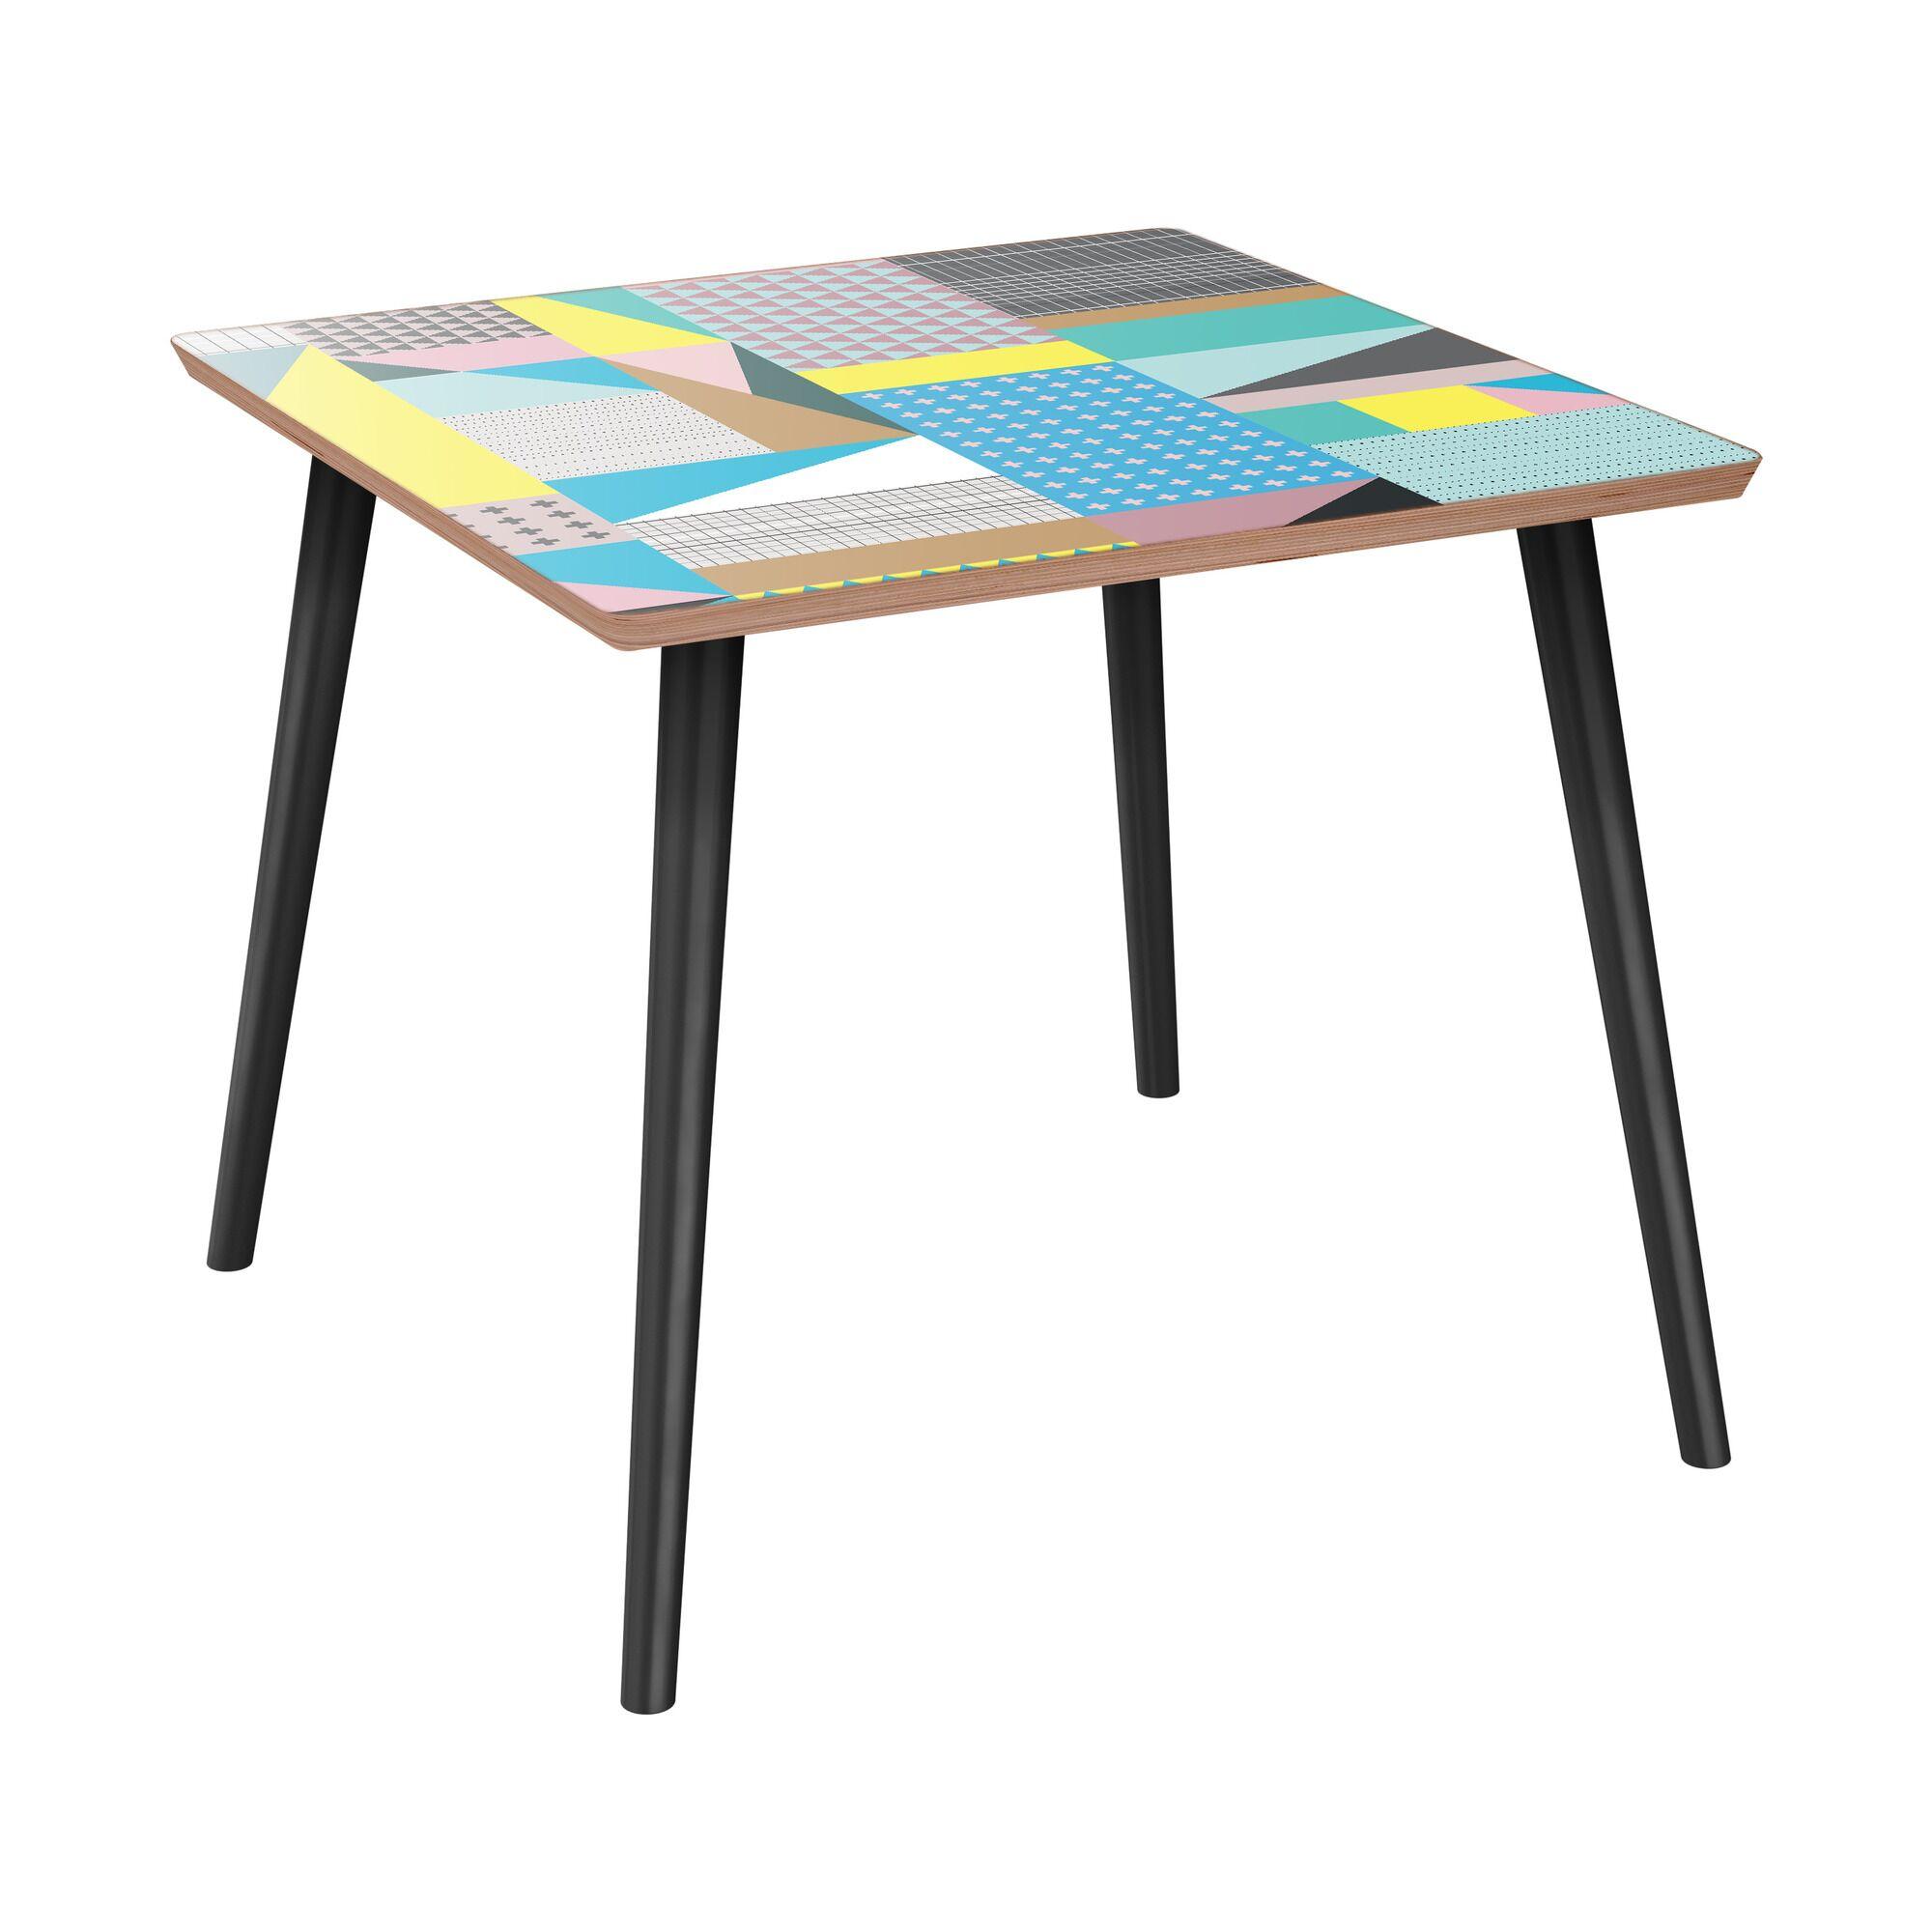 Killington End Table Table Base Color: Black, Table Top Color: Walnut